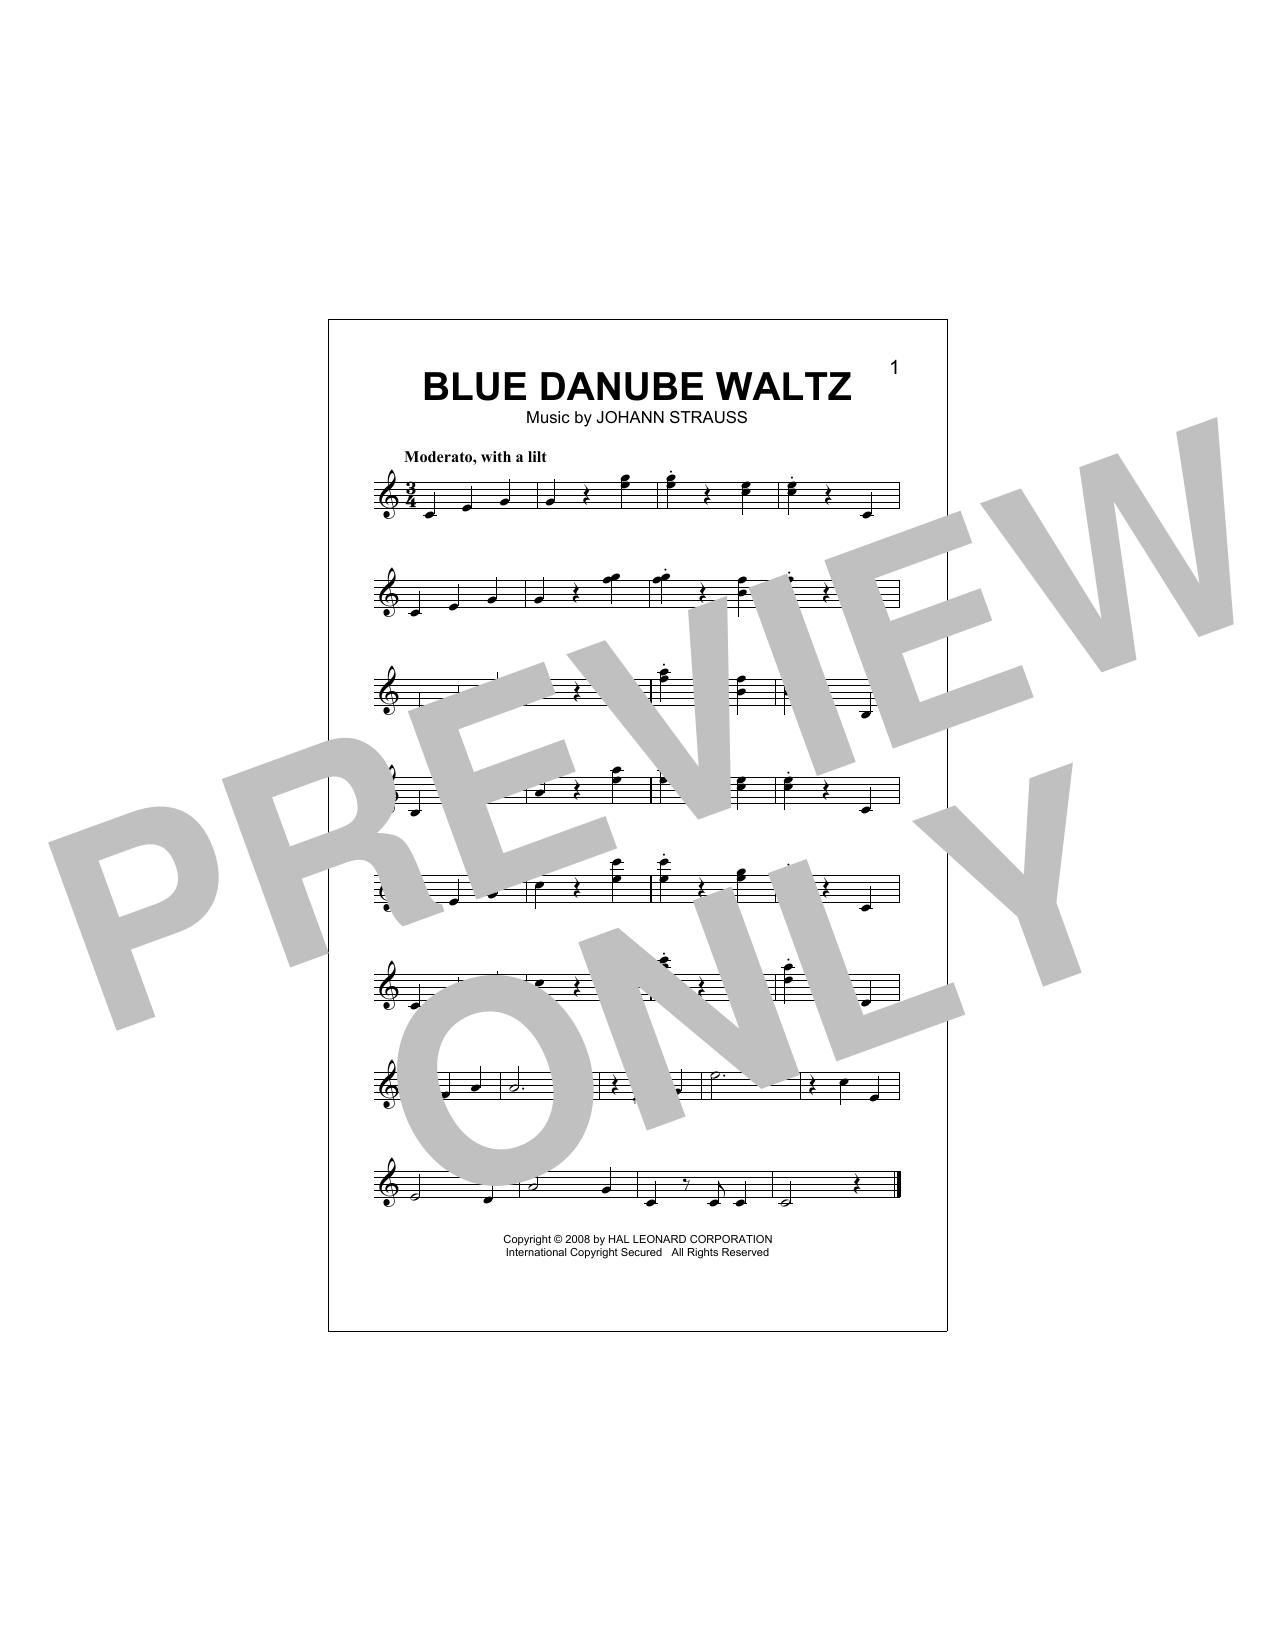 Blue Danube Waltz Sheet Music